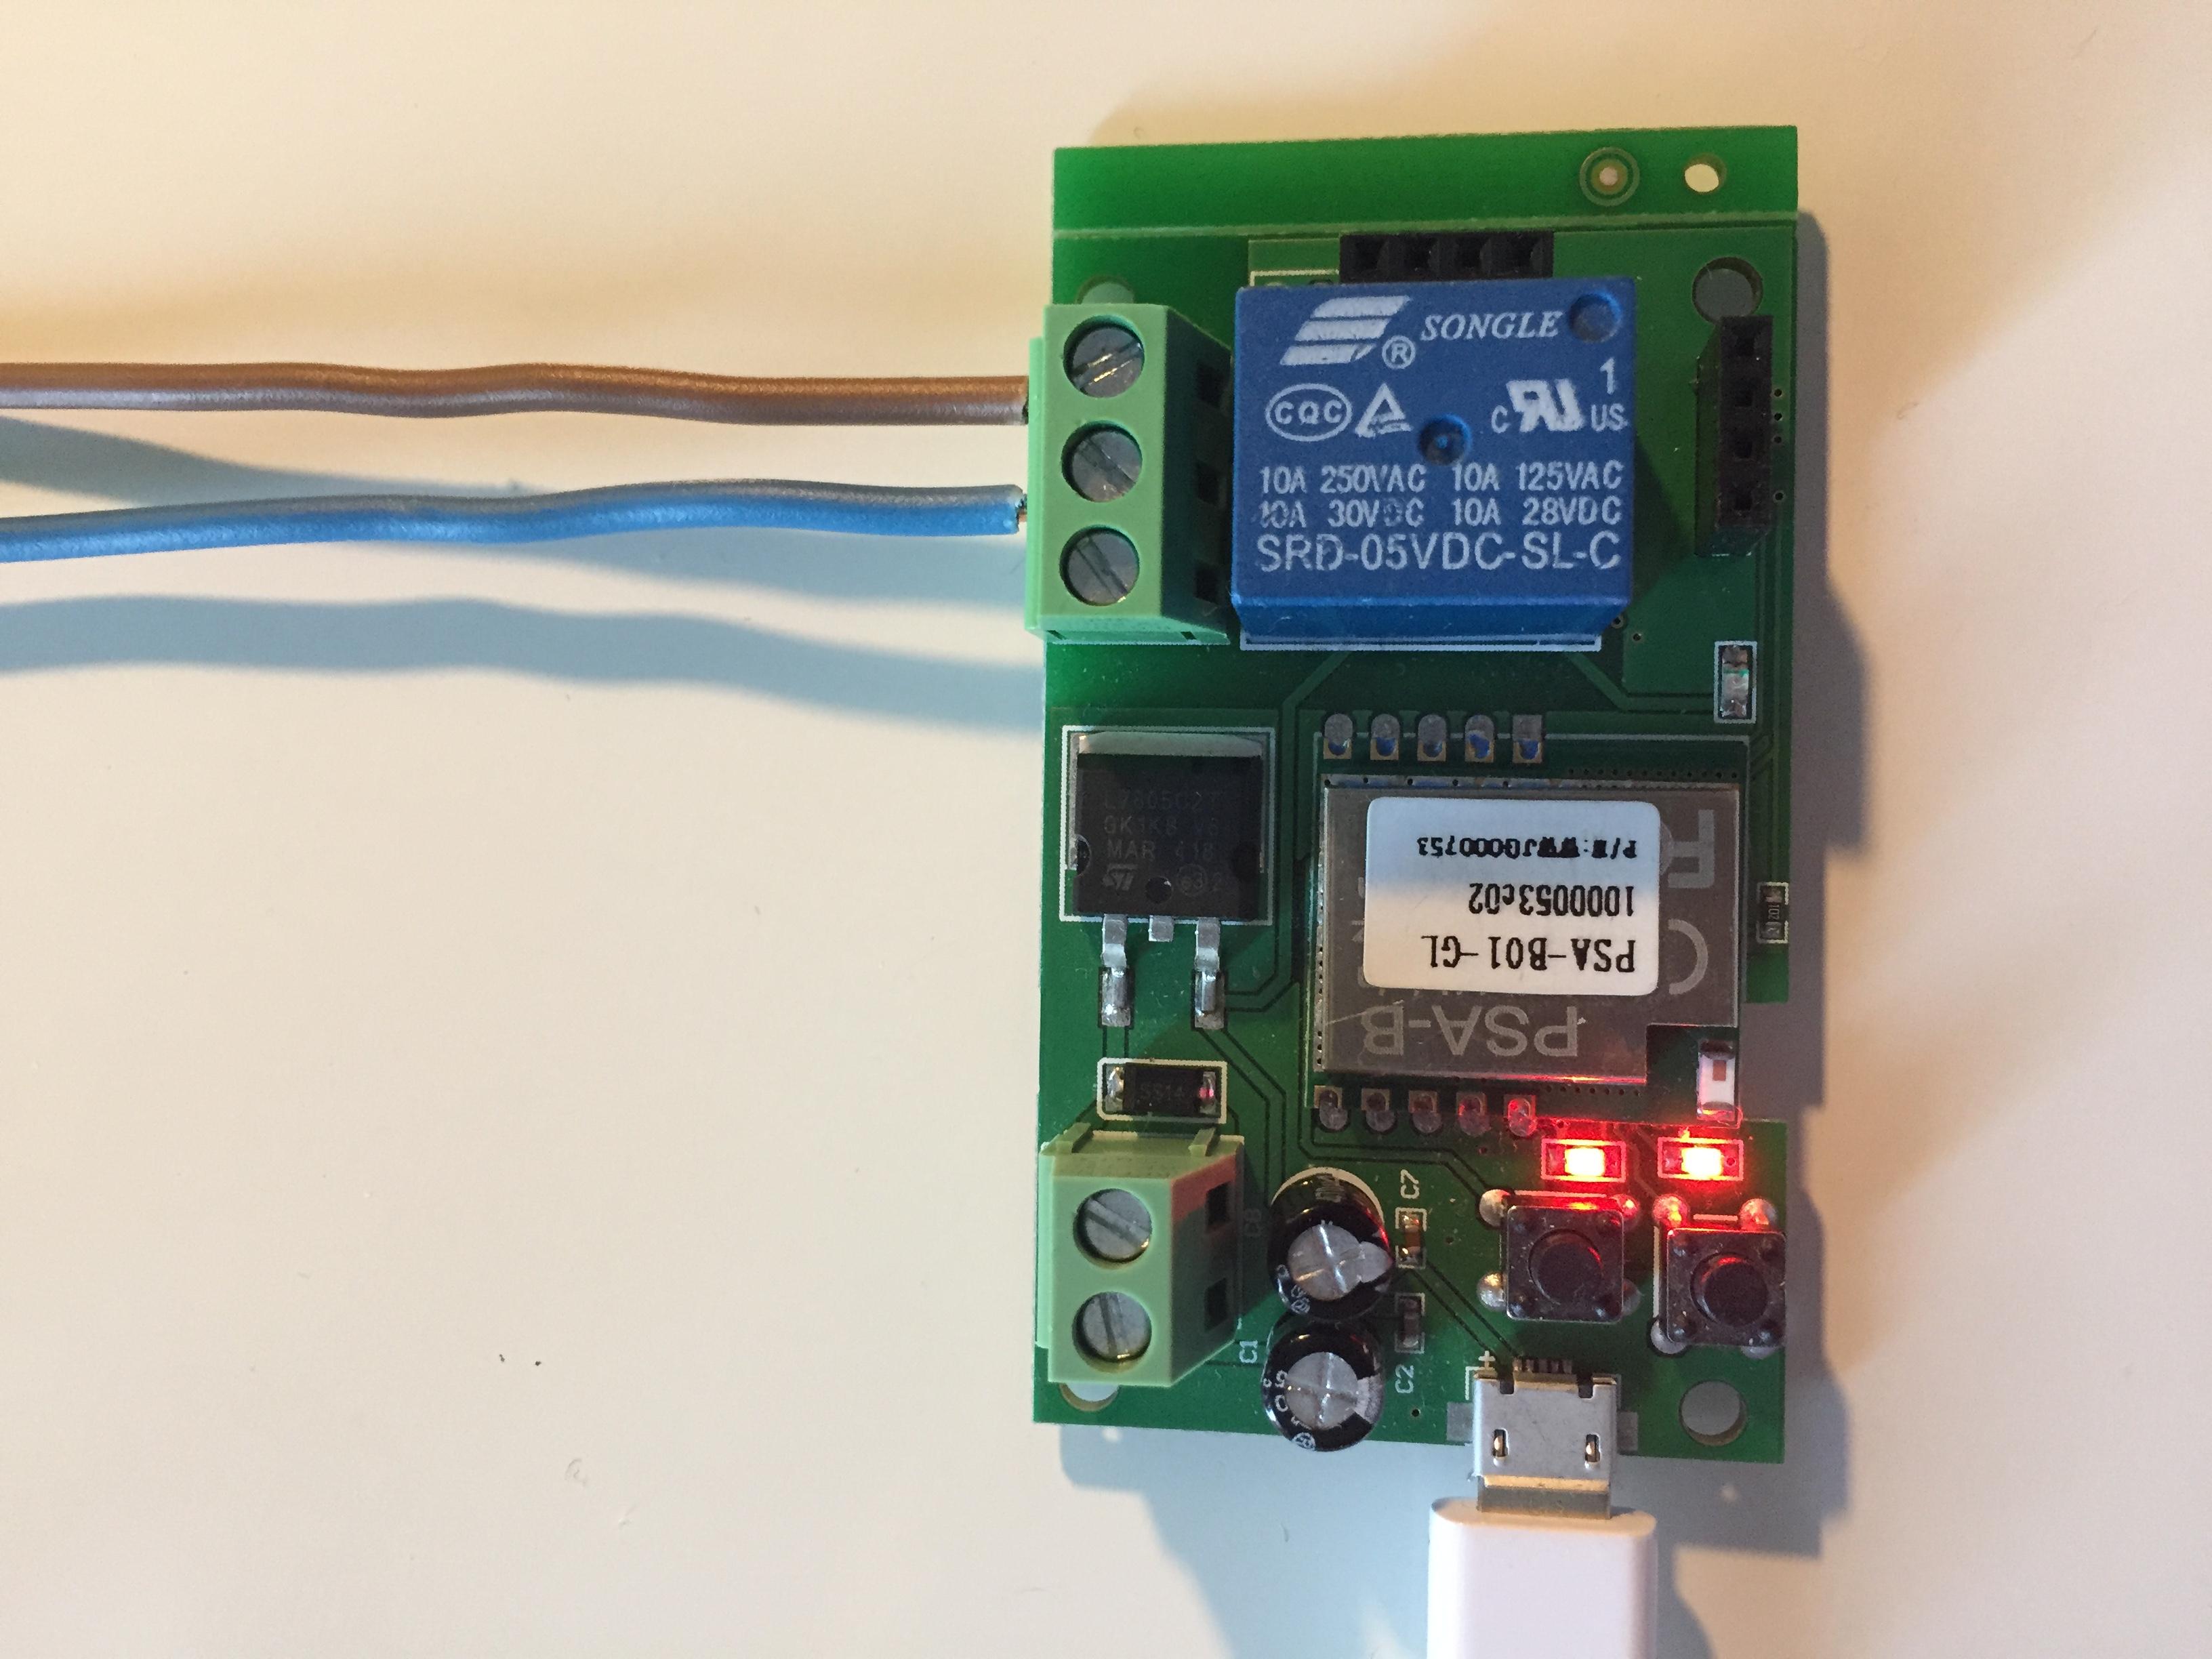 1 Channel Inching Self Lockiing Mode Wifi Wireless Switch